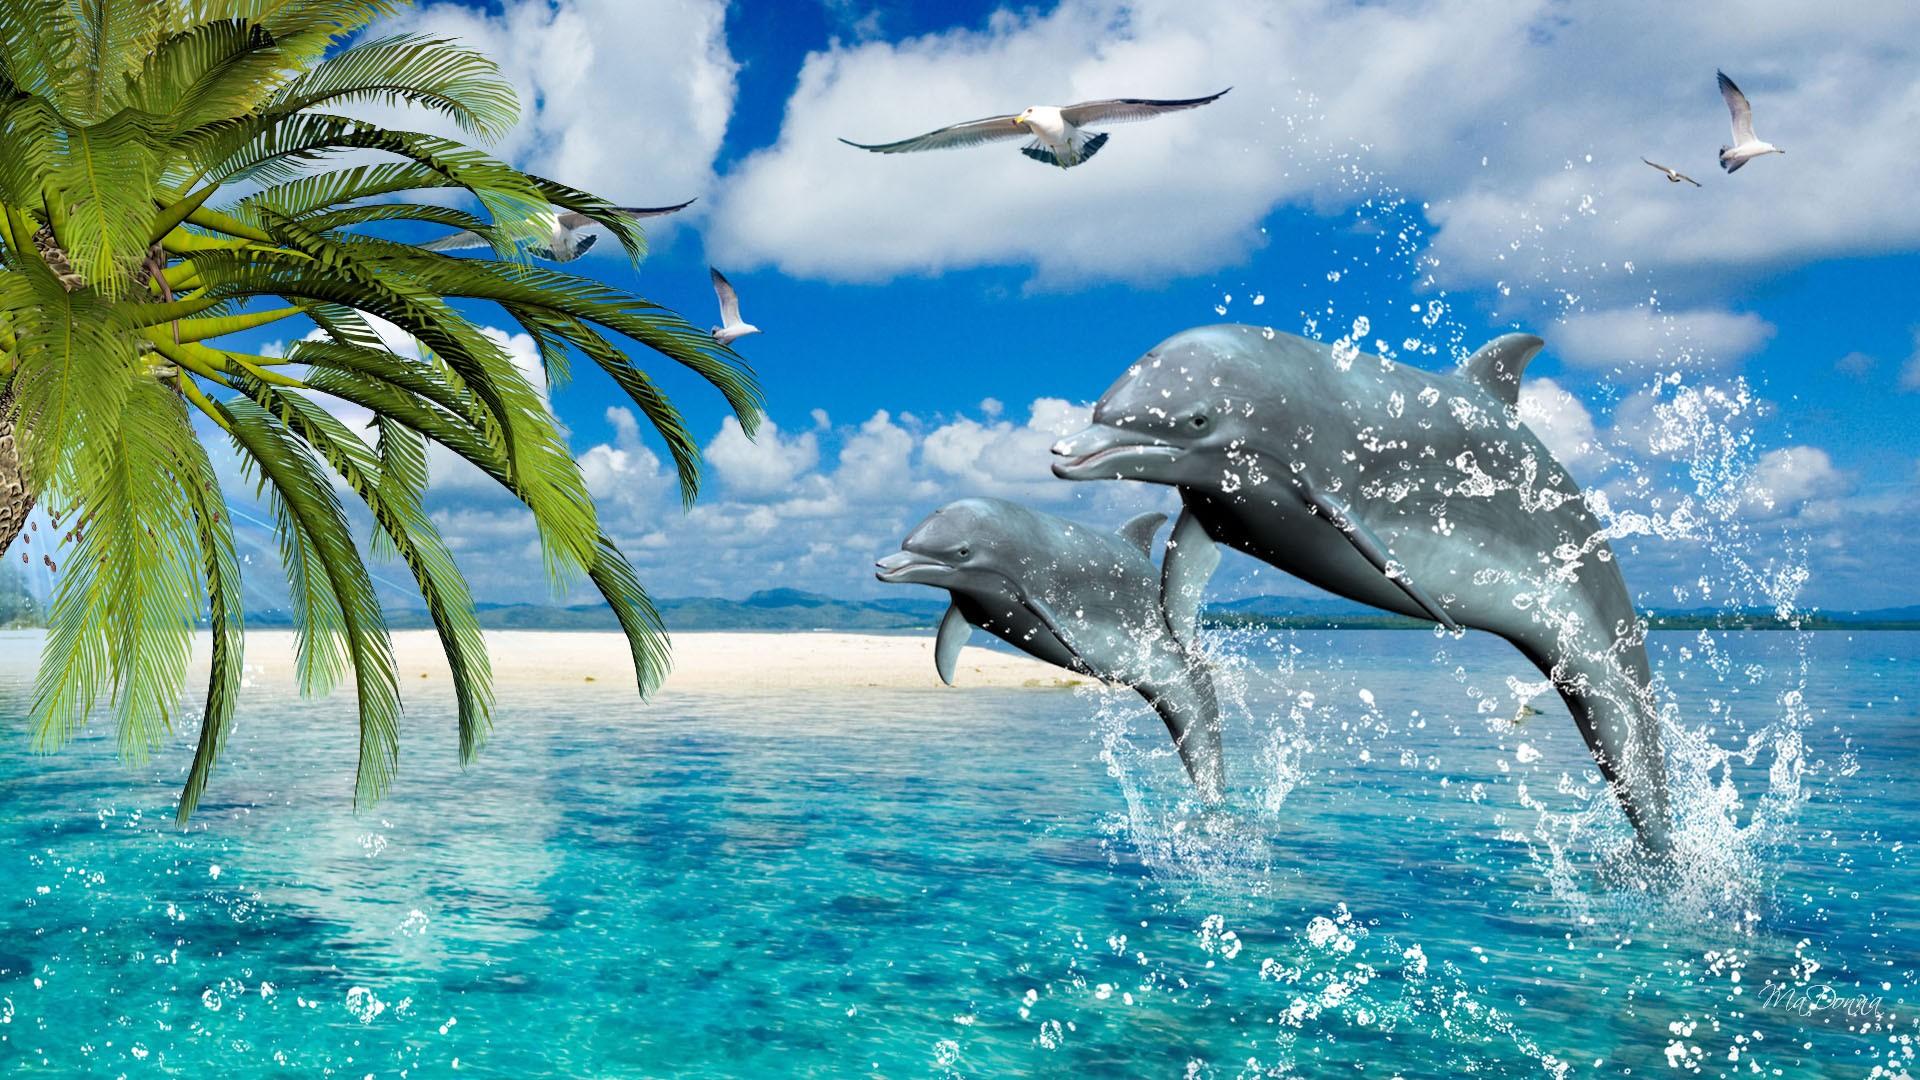 Dolphins Wallpapers For Desktop Wallpapersafari